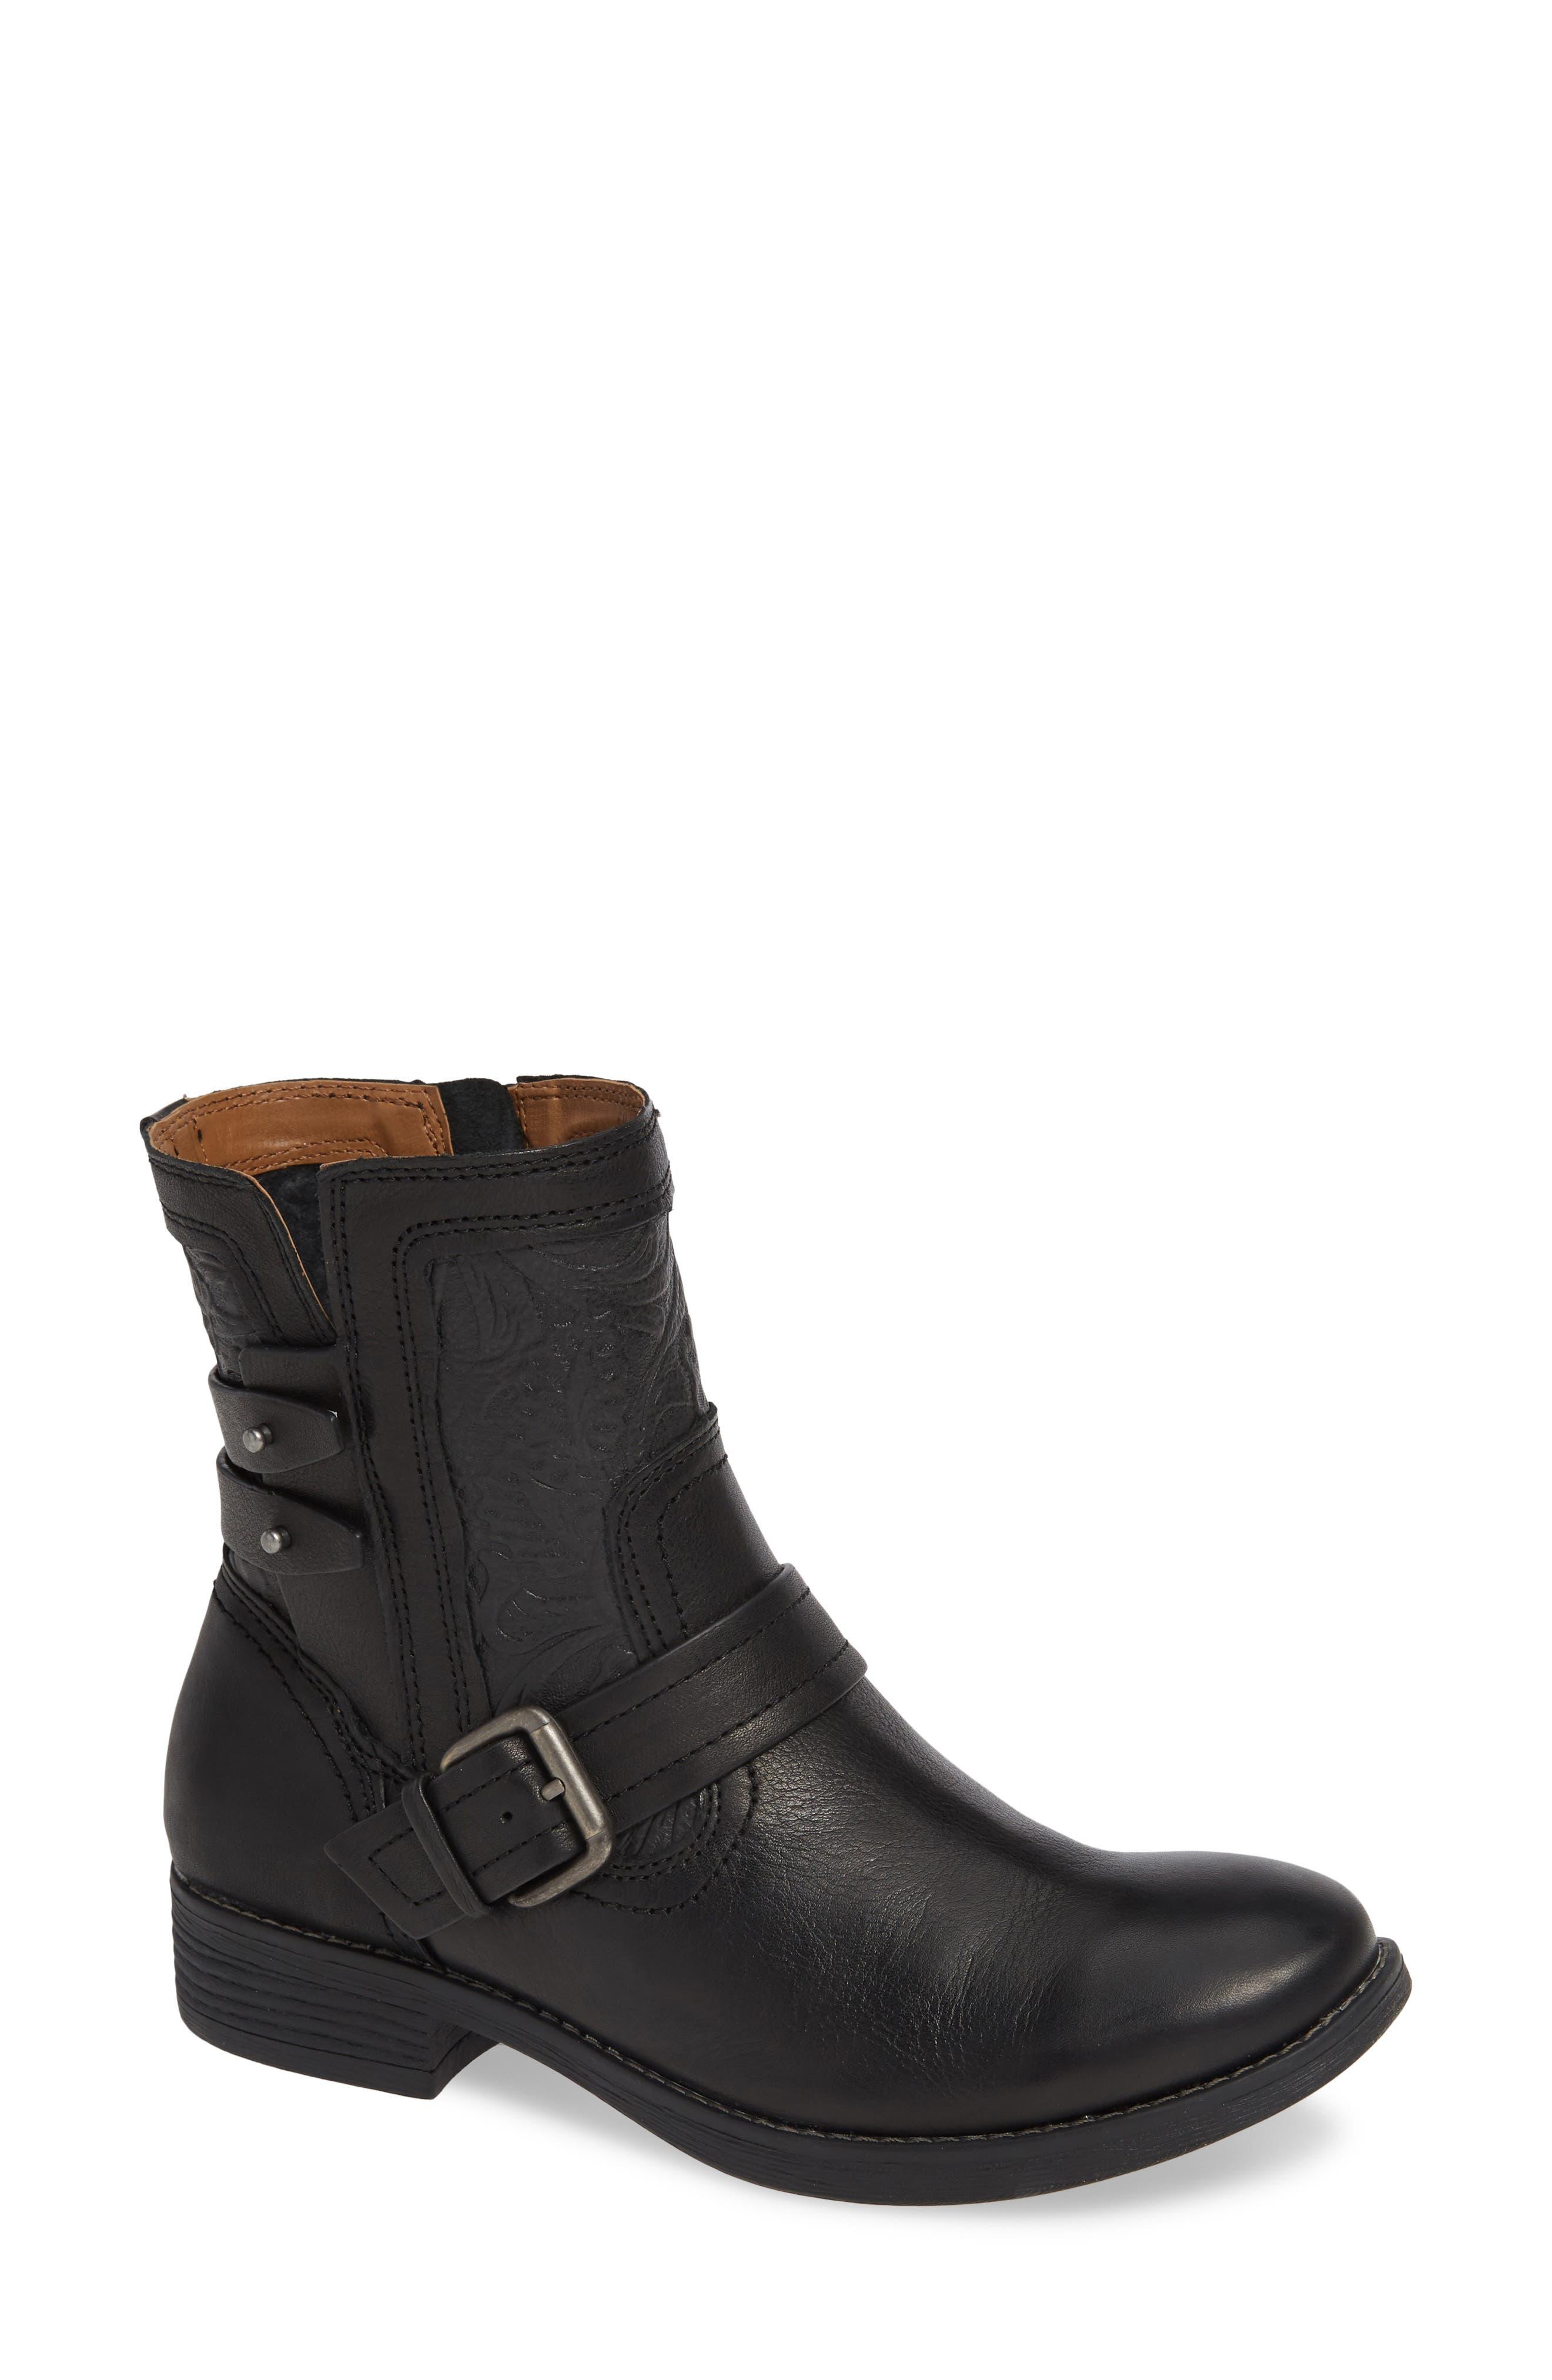 Comfortiva Torrance Boot, Black